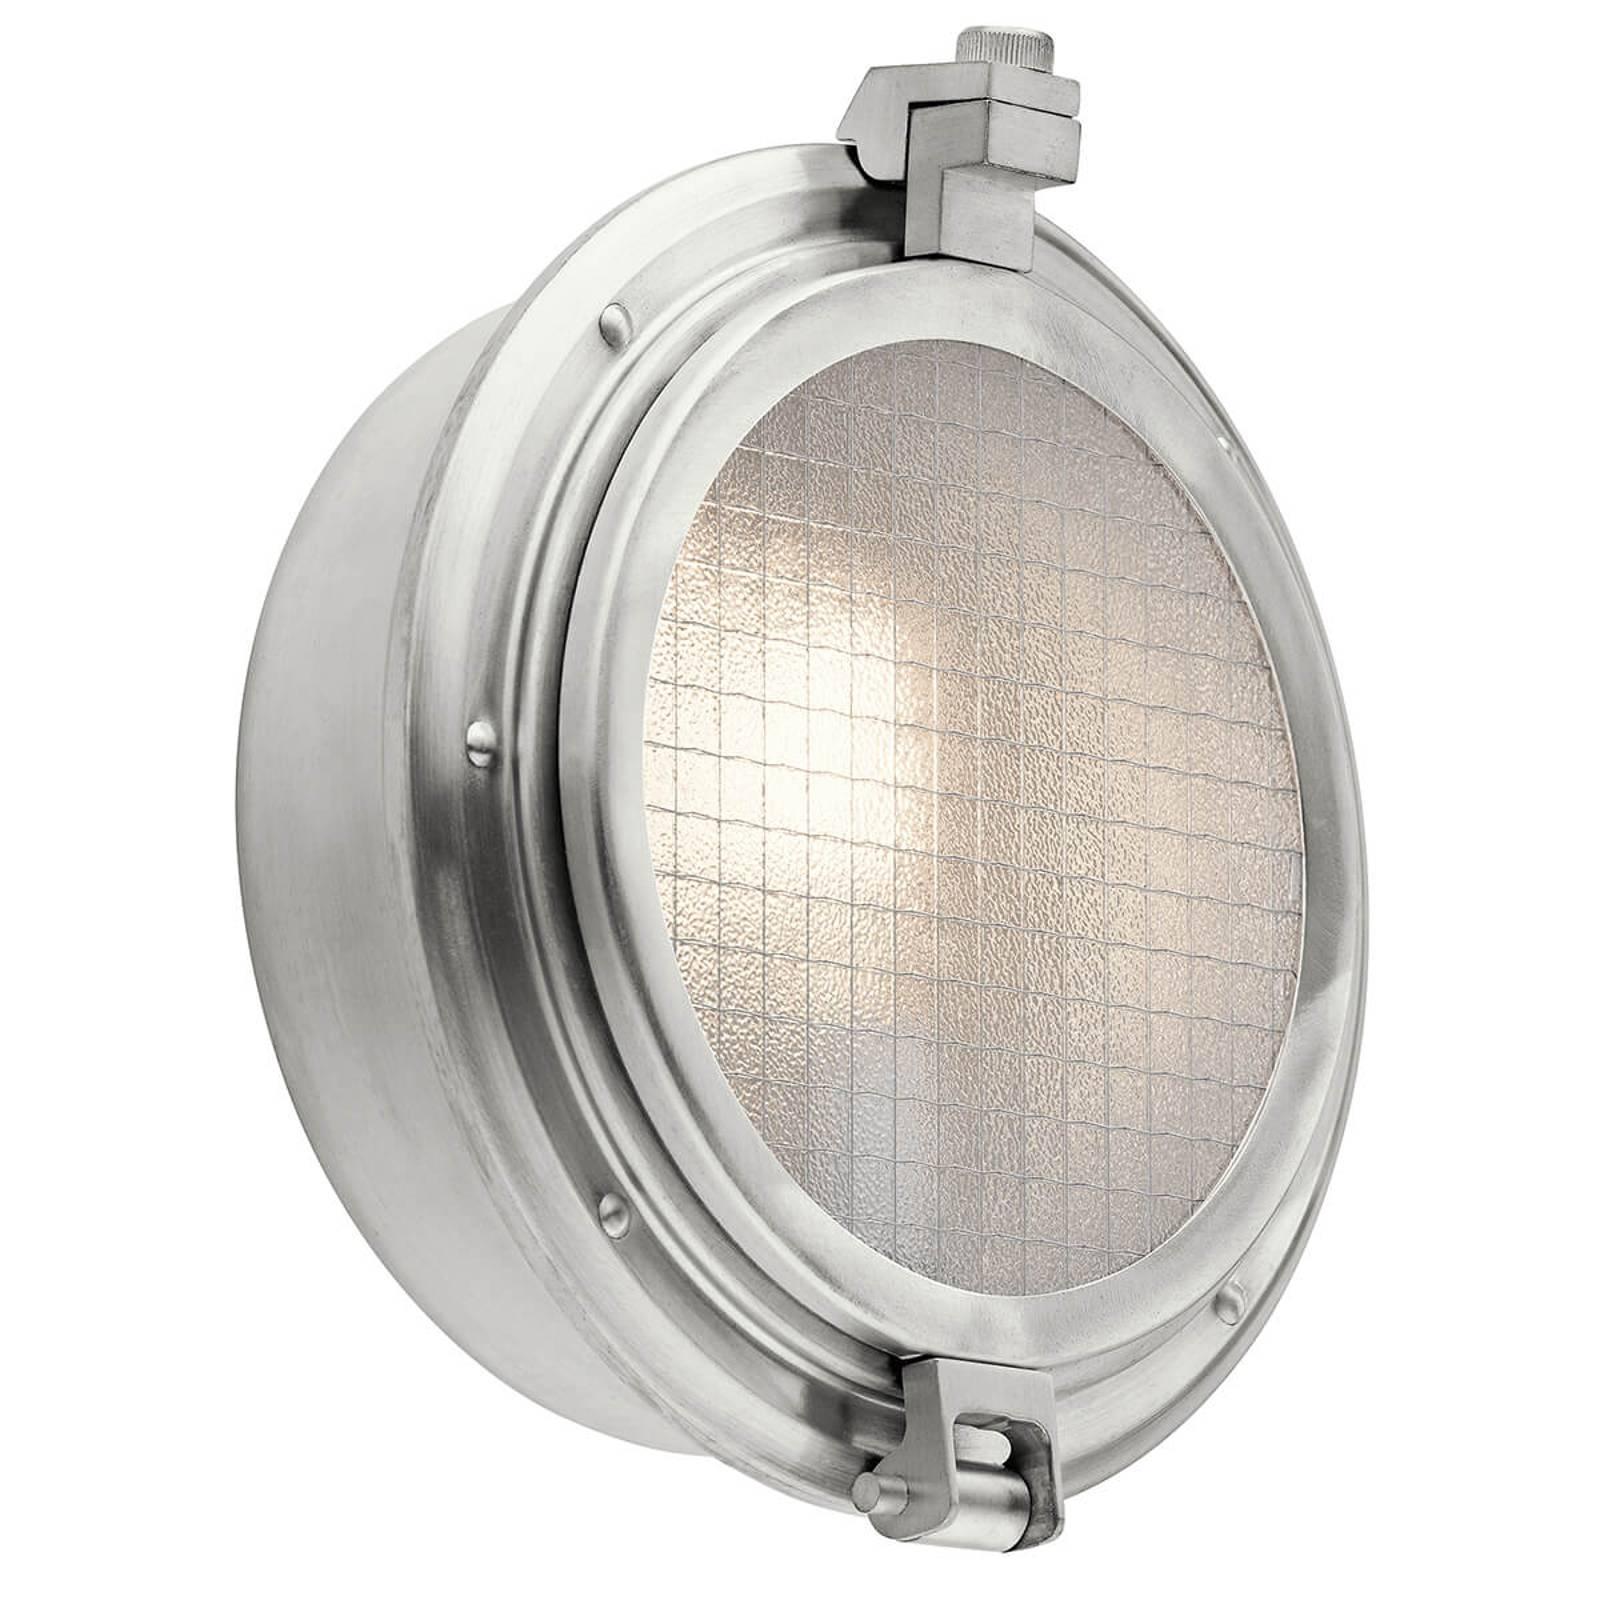 Clearpoint - buitenwandlamp maritieme stijl